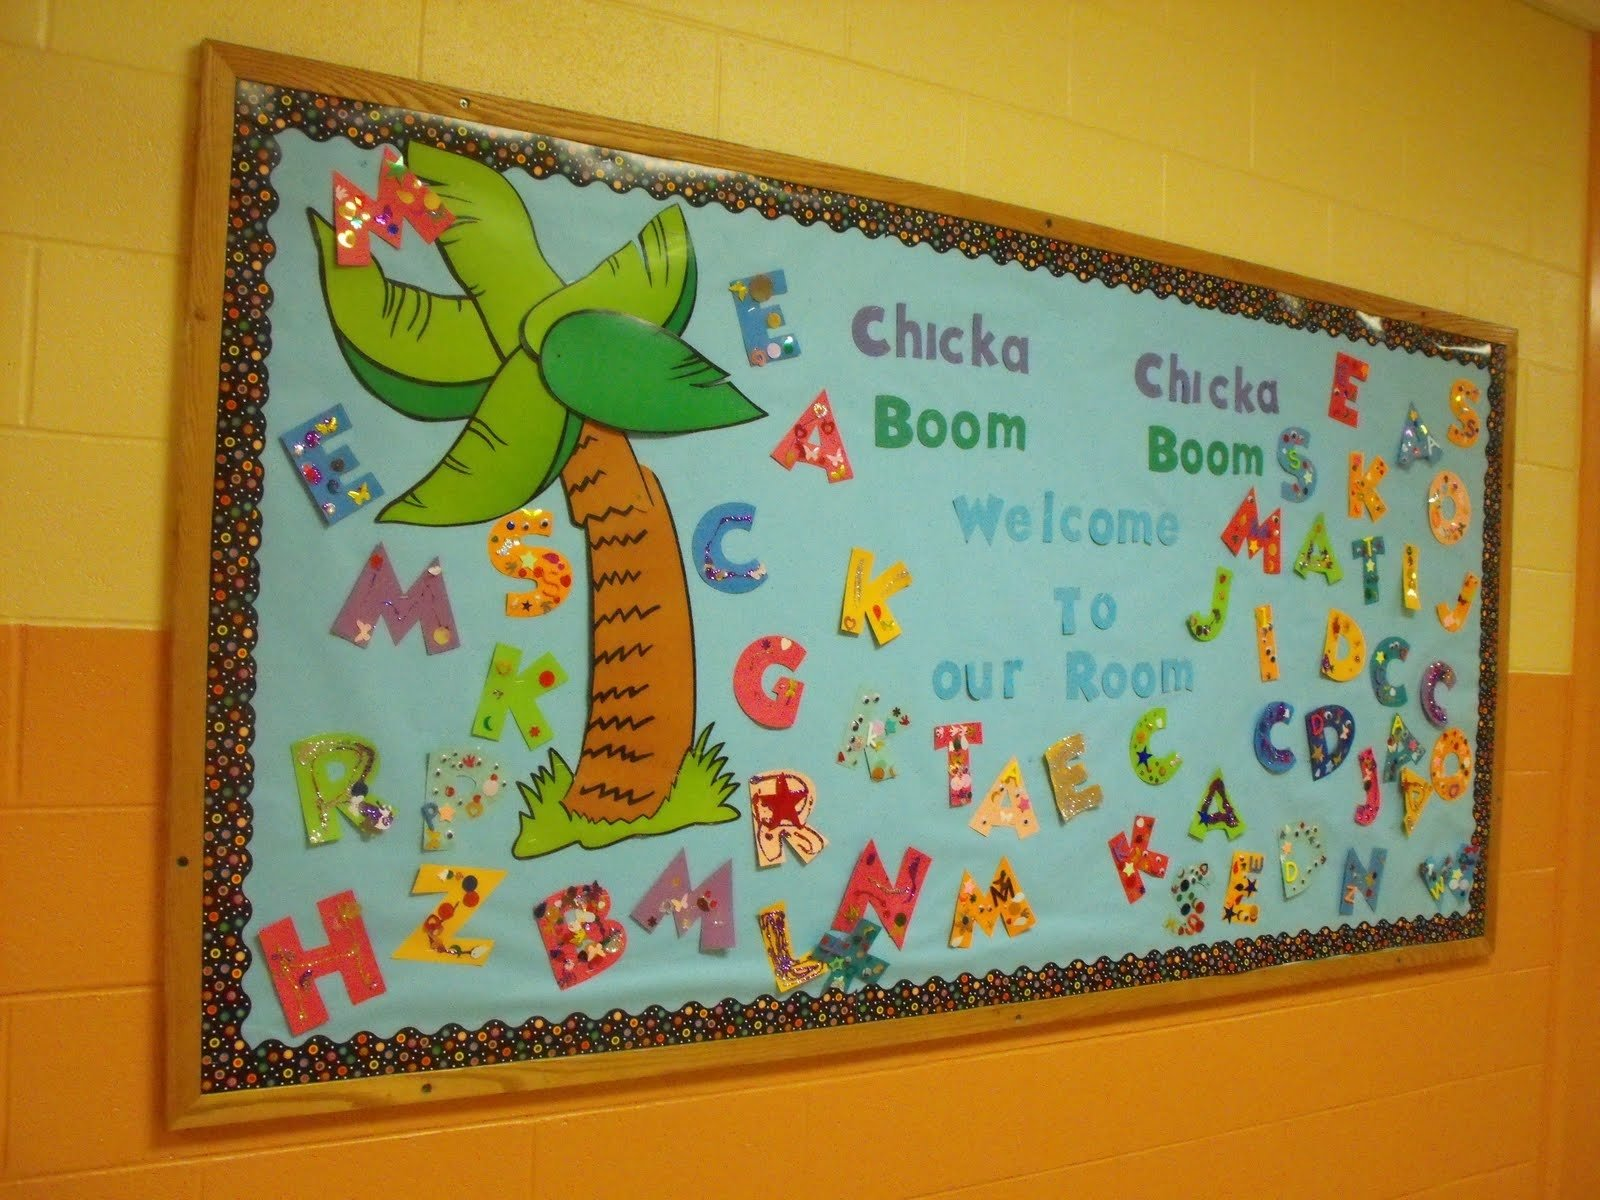 10 Best Chicka Chicka Boom Boom Bulletin Board Ideas scrap and teach new chicka chicka boom boom bulletin board 2020